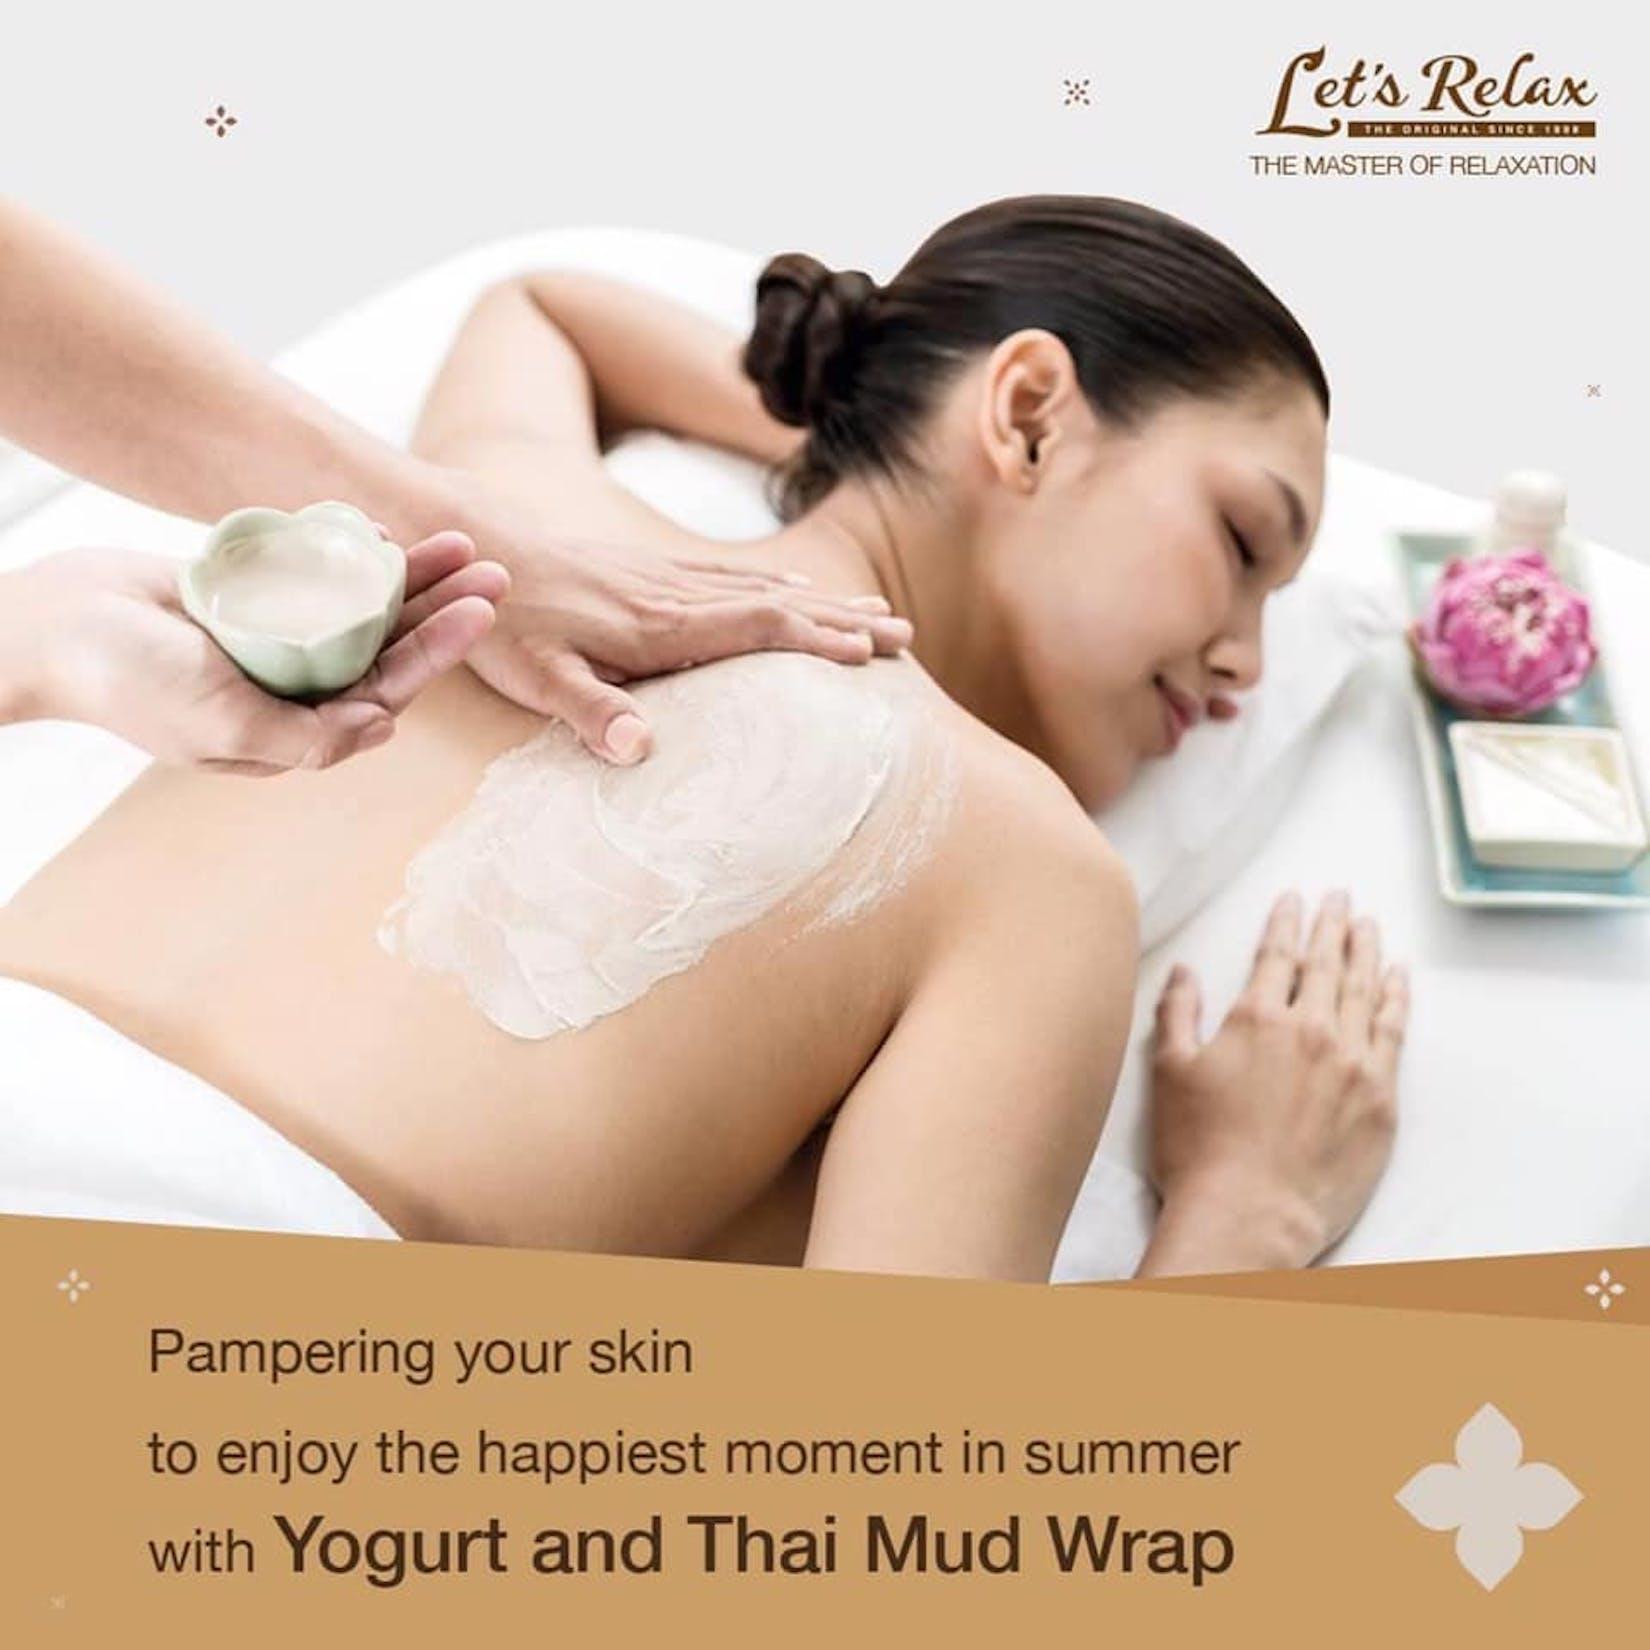 Let's Relax Spa Myanmar | Beauty